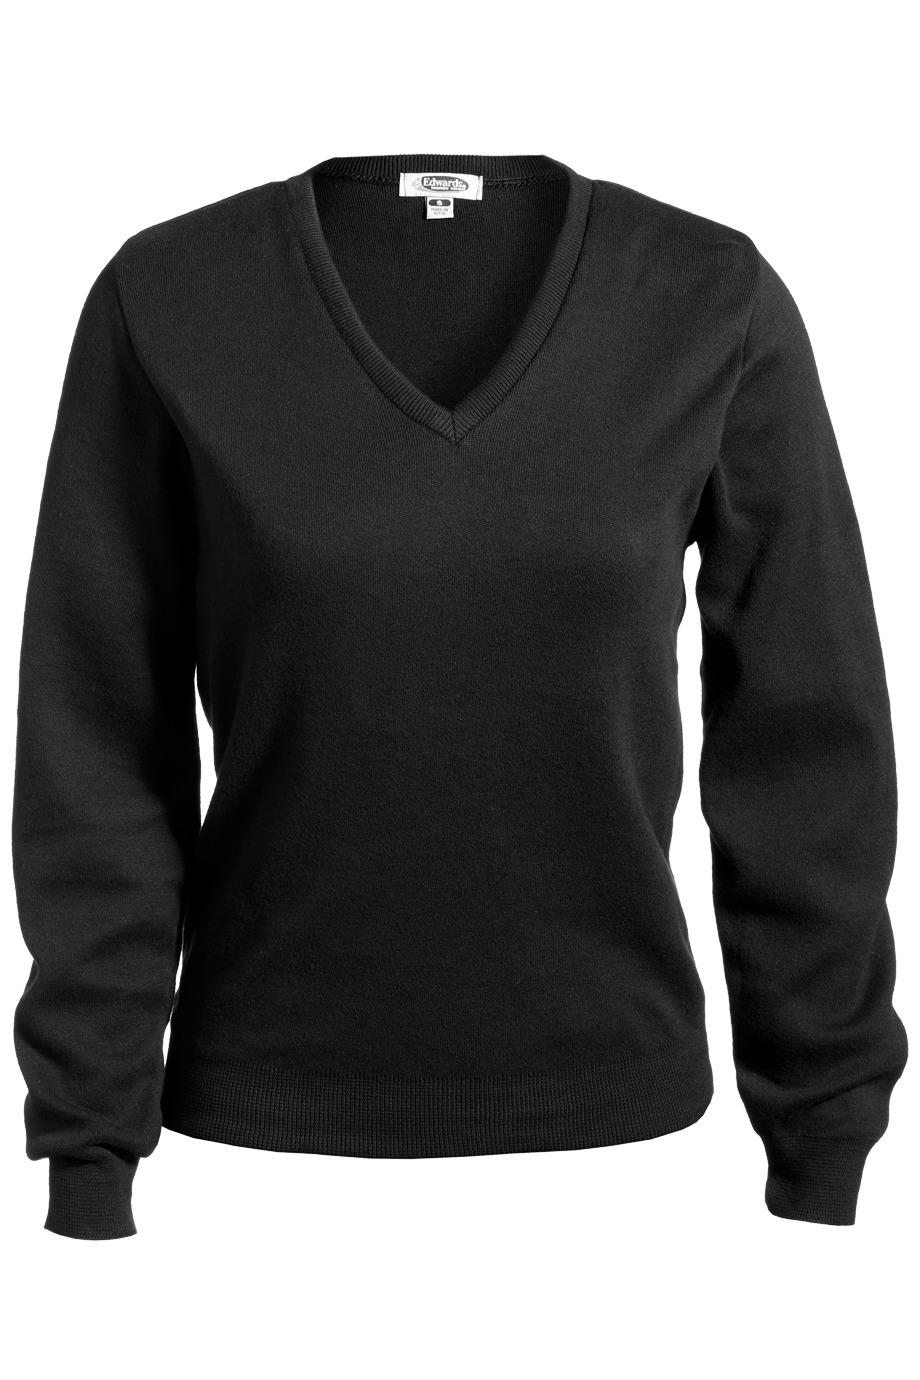 Edwards Garment 7090 - Ladies' V-Neck Cotton Sweater